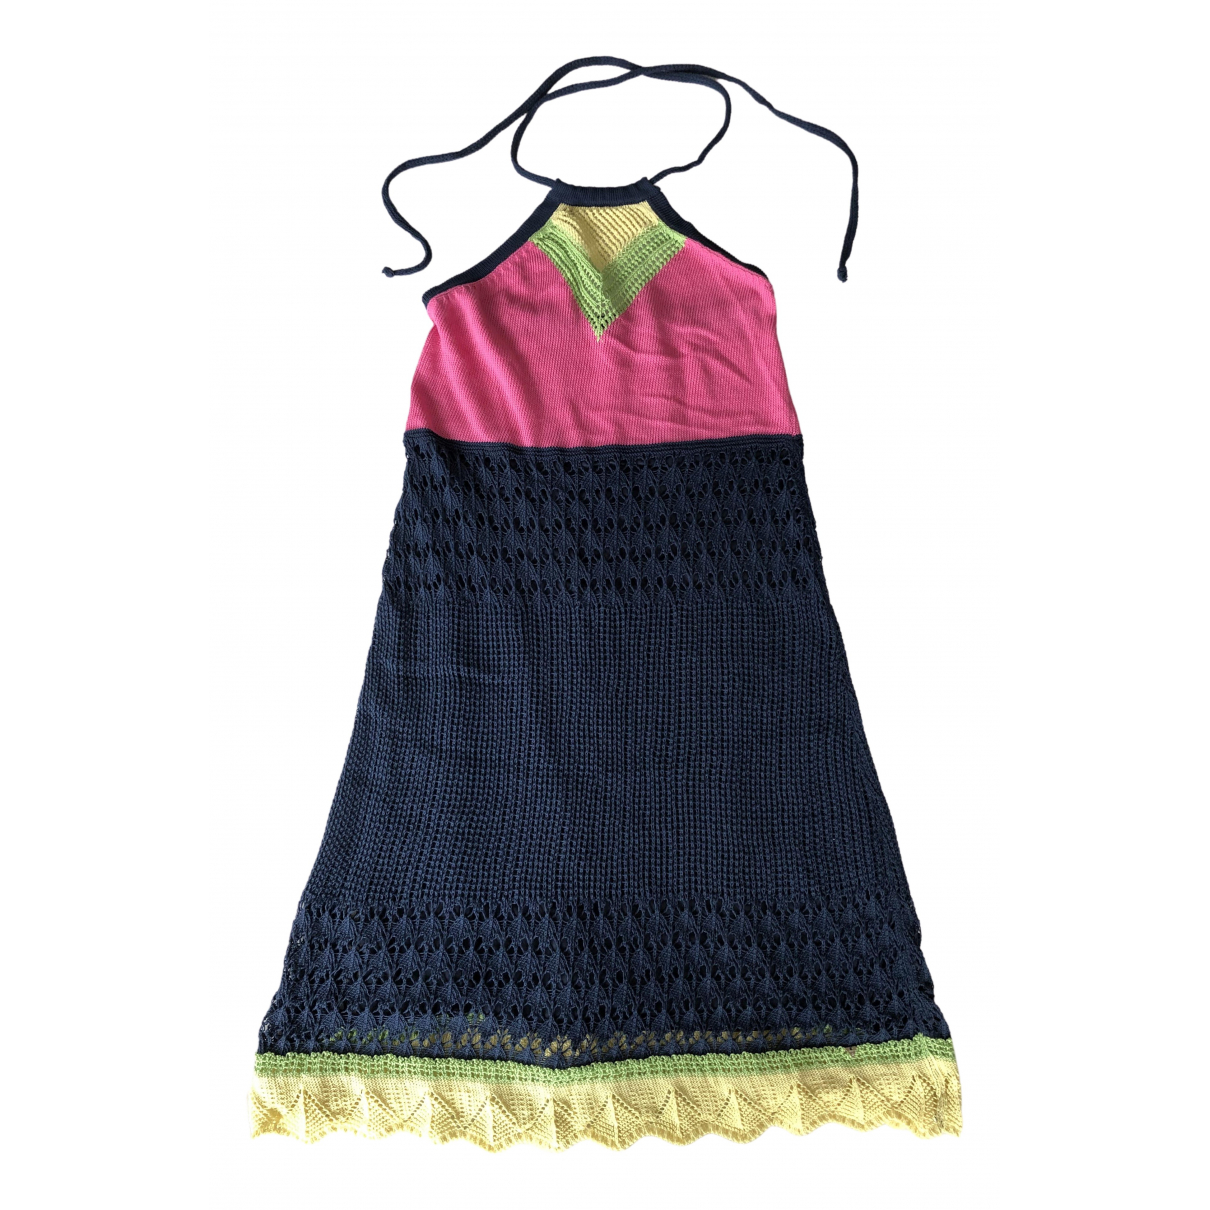 Guess \N Multicolour Cotton dress for Women L International